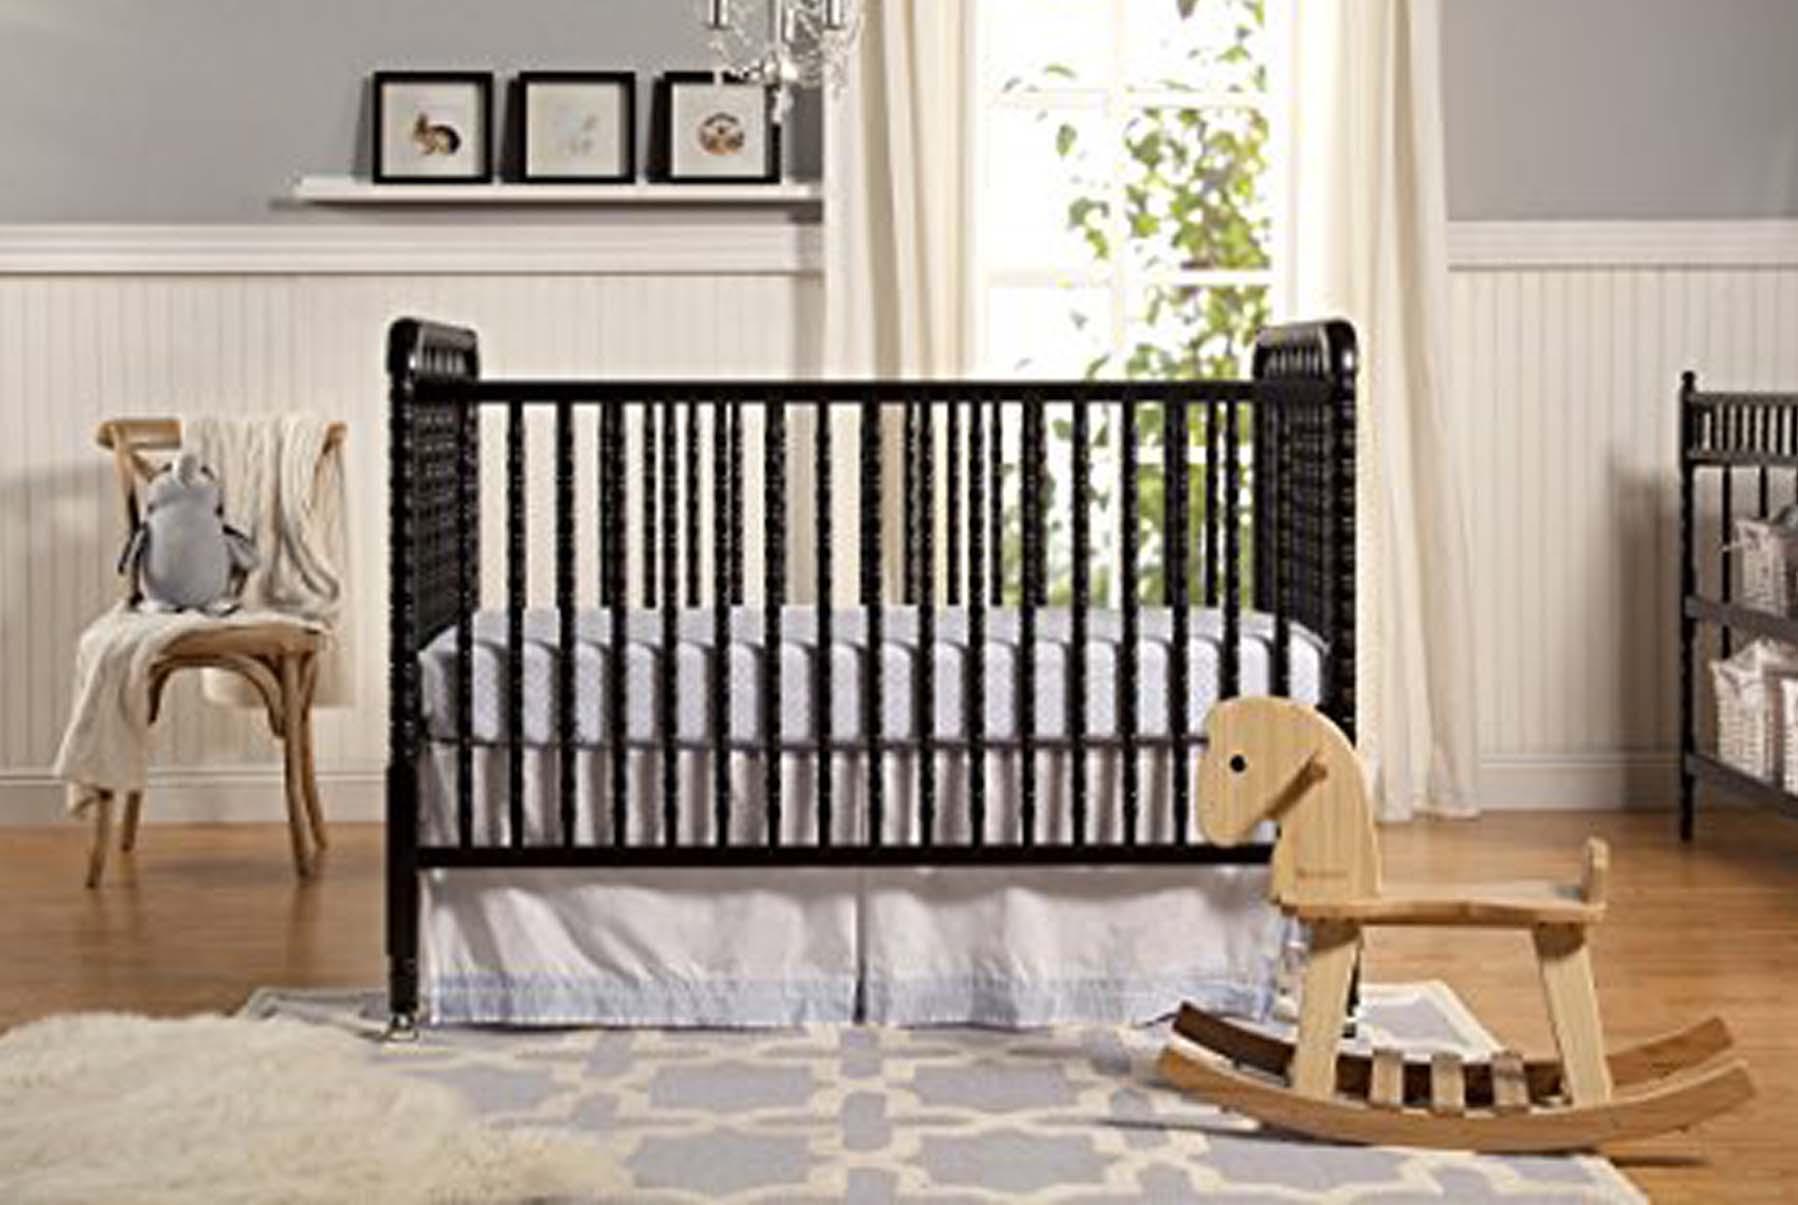 Best Portable Full Size Crib Davinci Jenny Lind 3 In 1